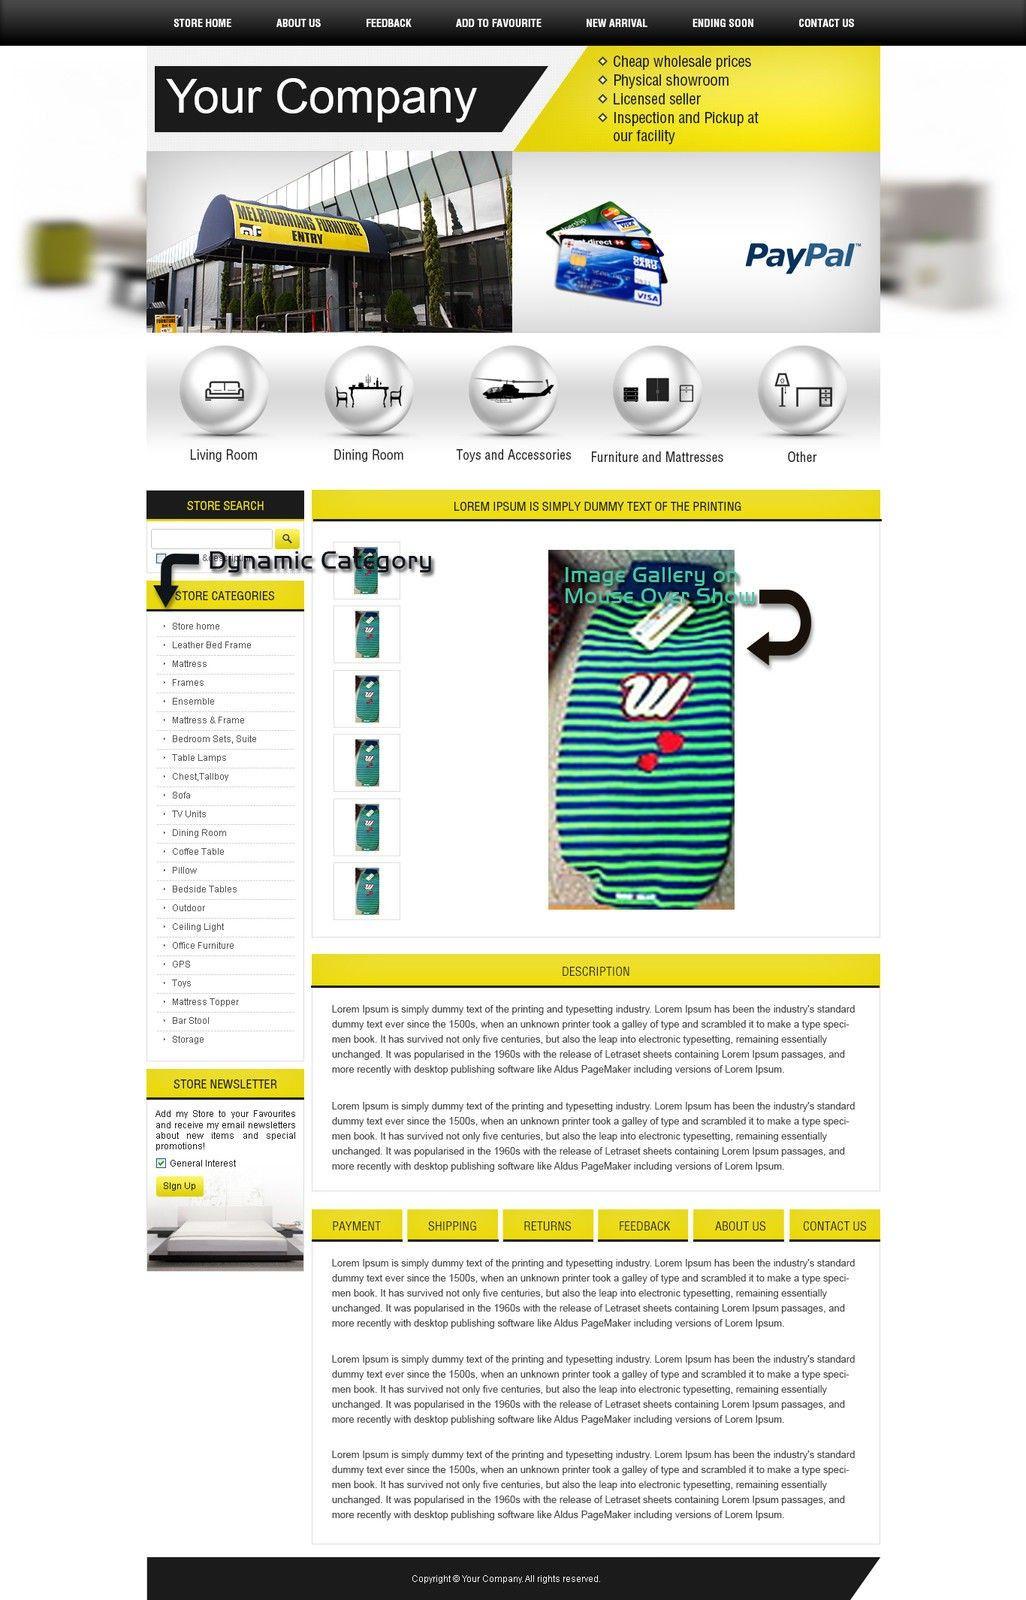 PROFESSIONAL EBAY SHOP STORE DESIGN, EBAYLISTING HTML